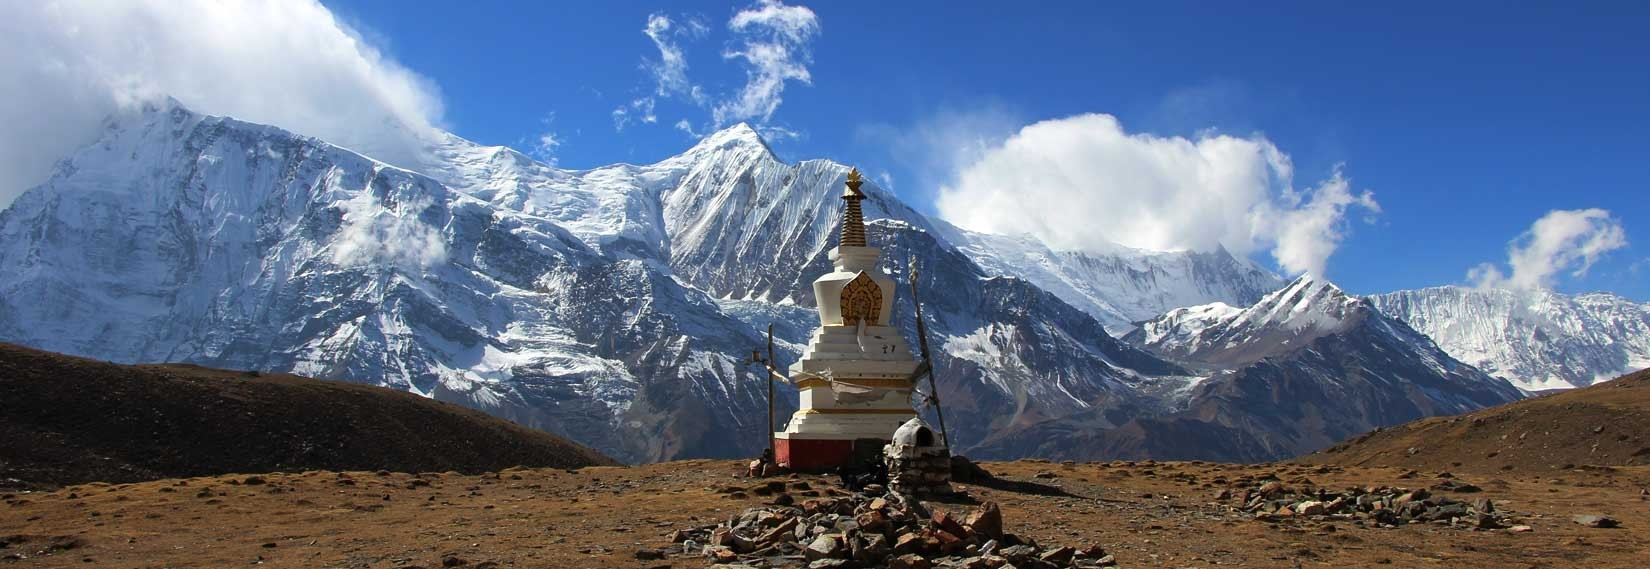 High Passes in Annapurna